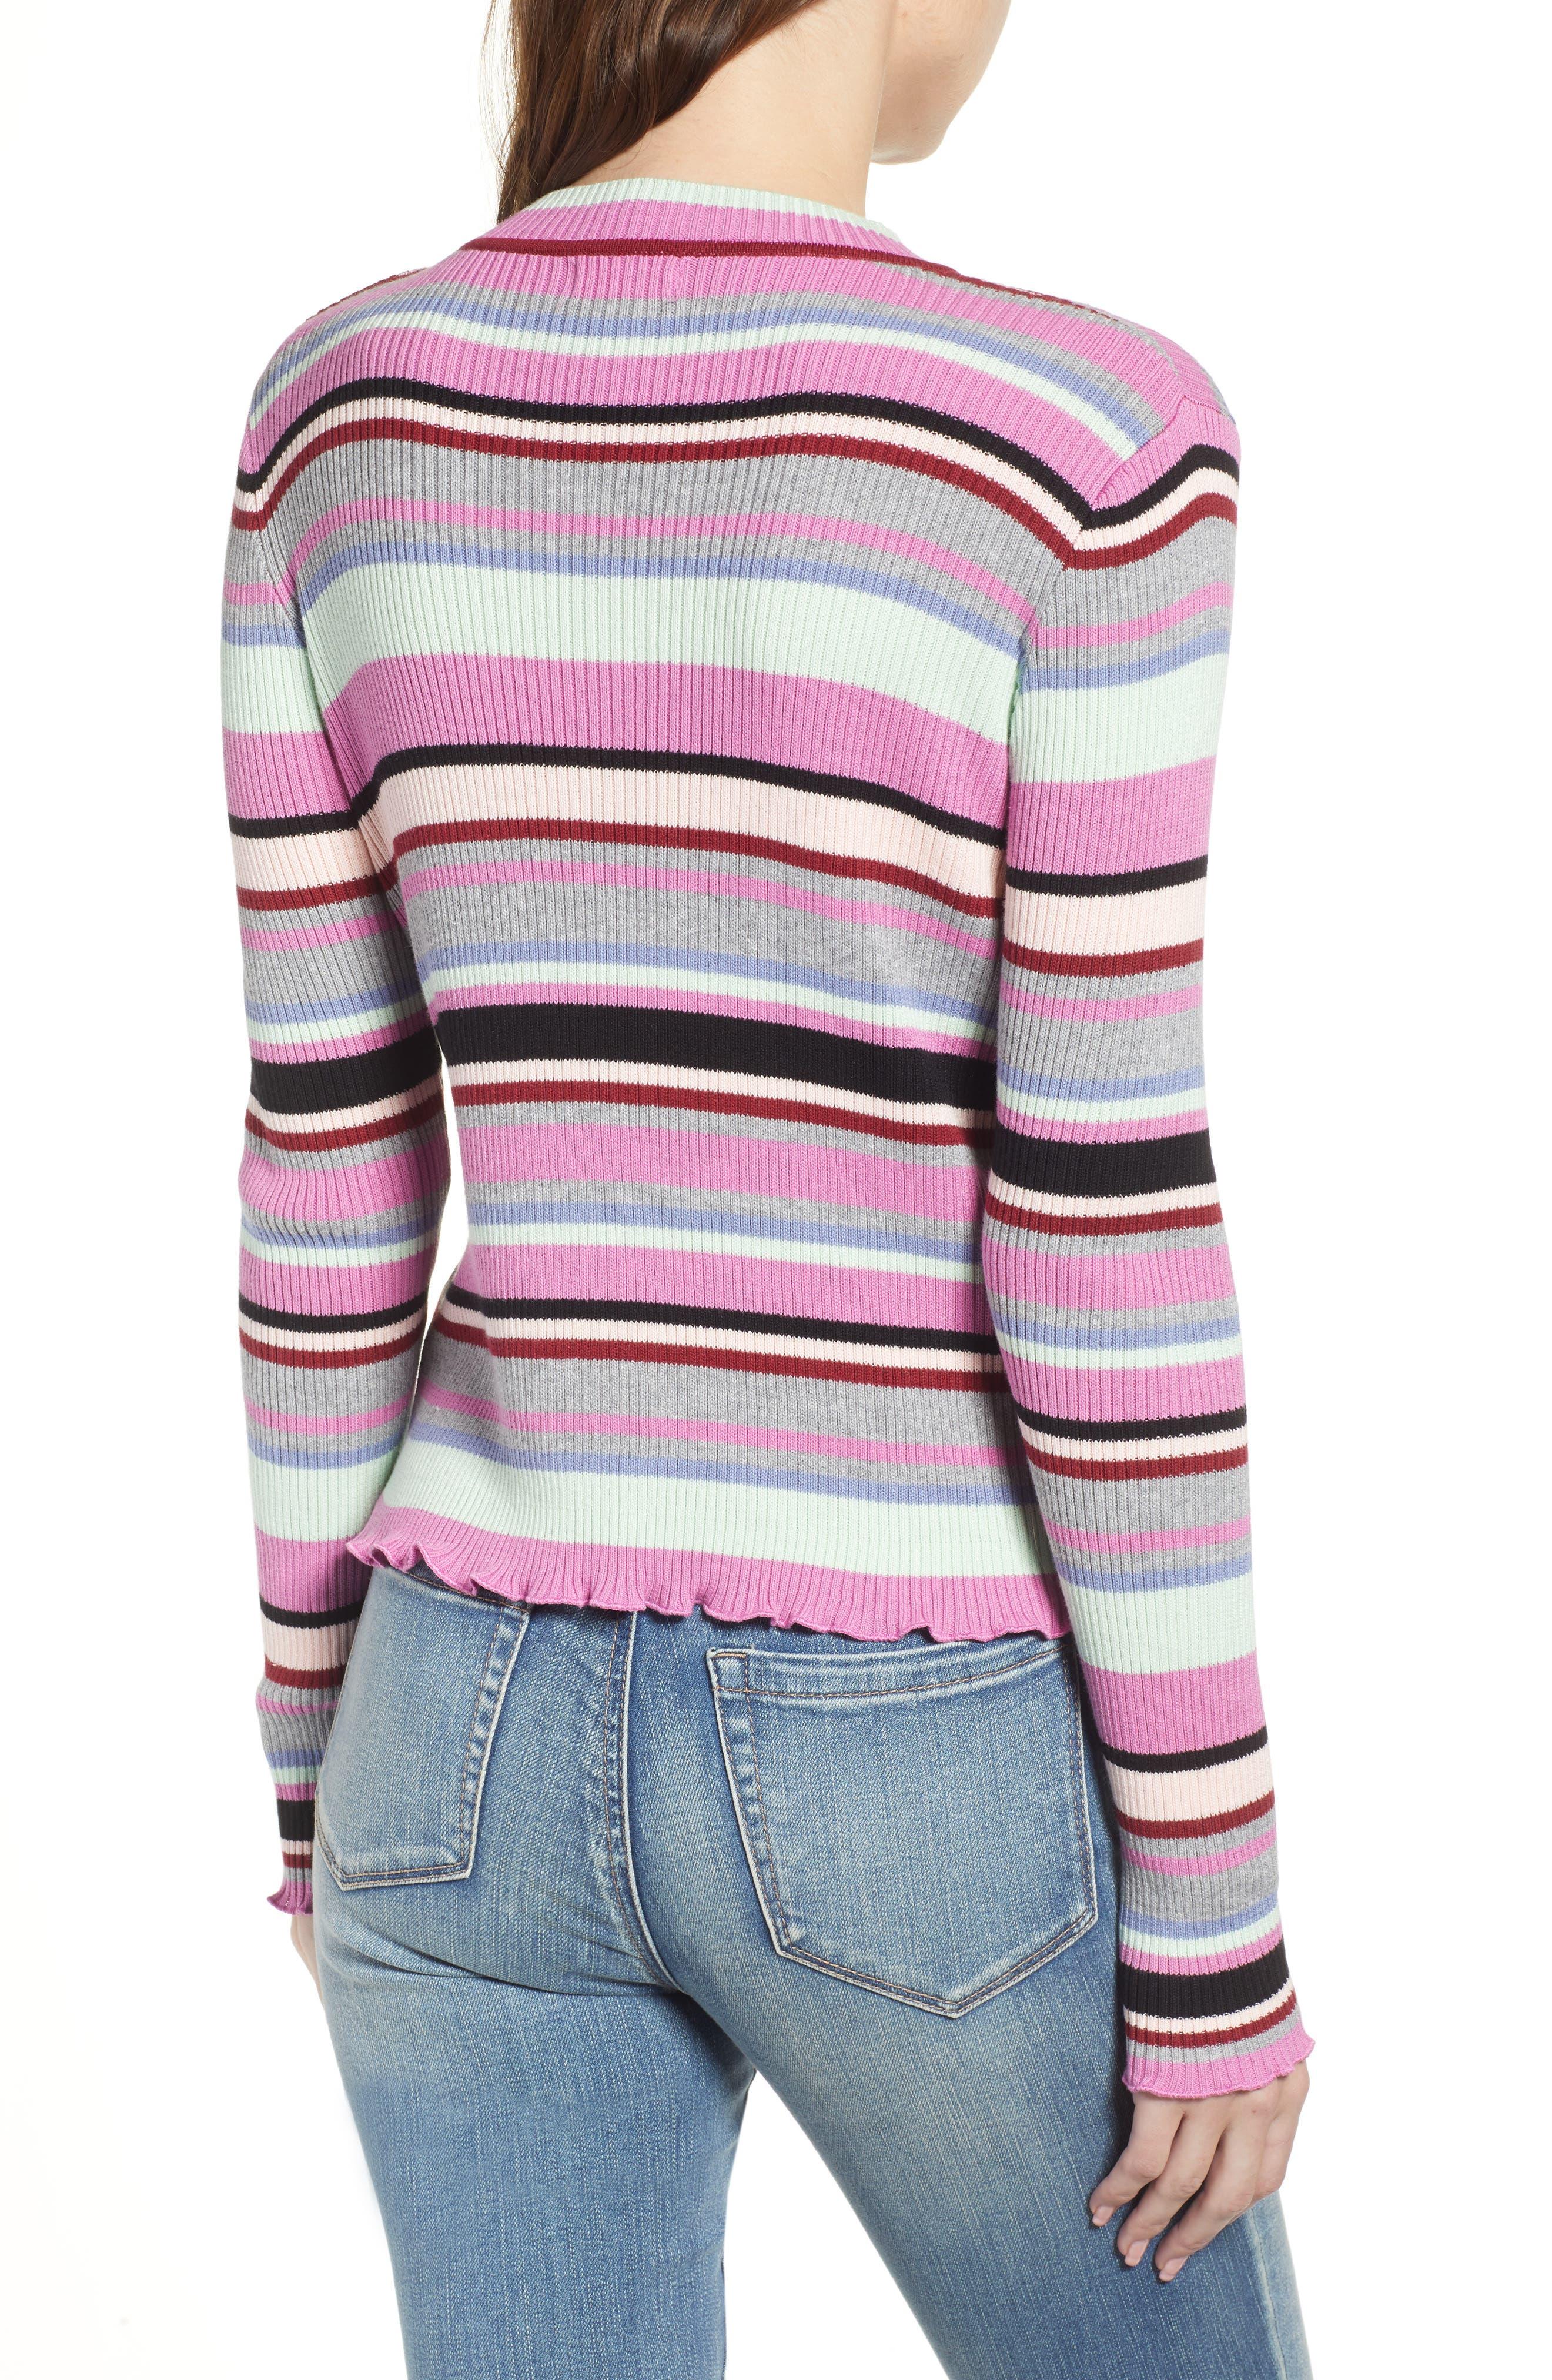 Ribbed Lettuce Edge Stripe Sweater,                             Alternate thumbnail 2, color,                             PURPLE TAFFY KARA MULTI STRIPE